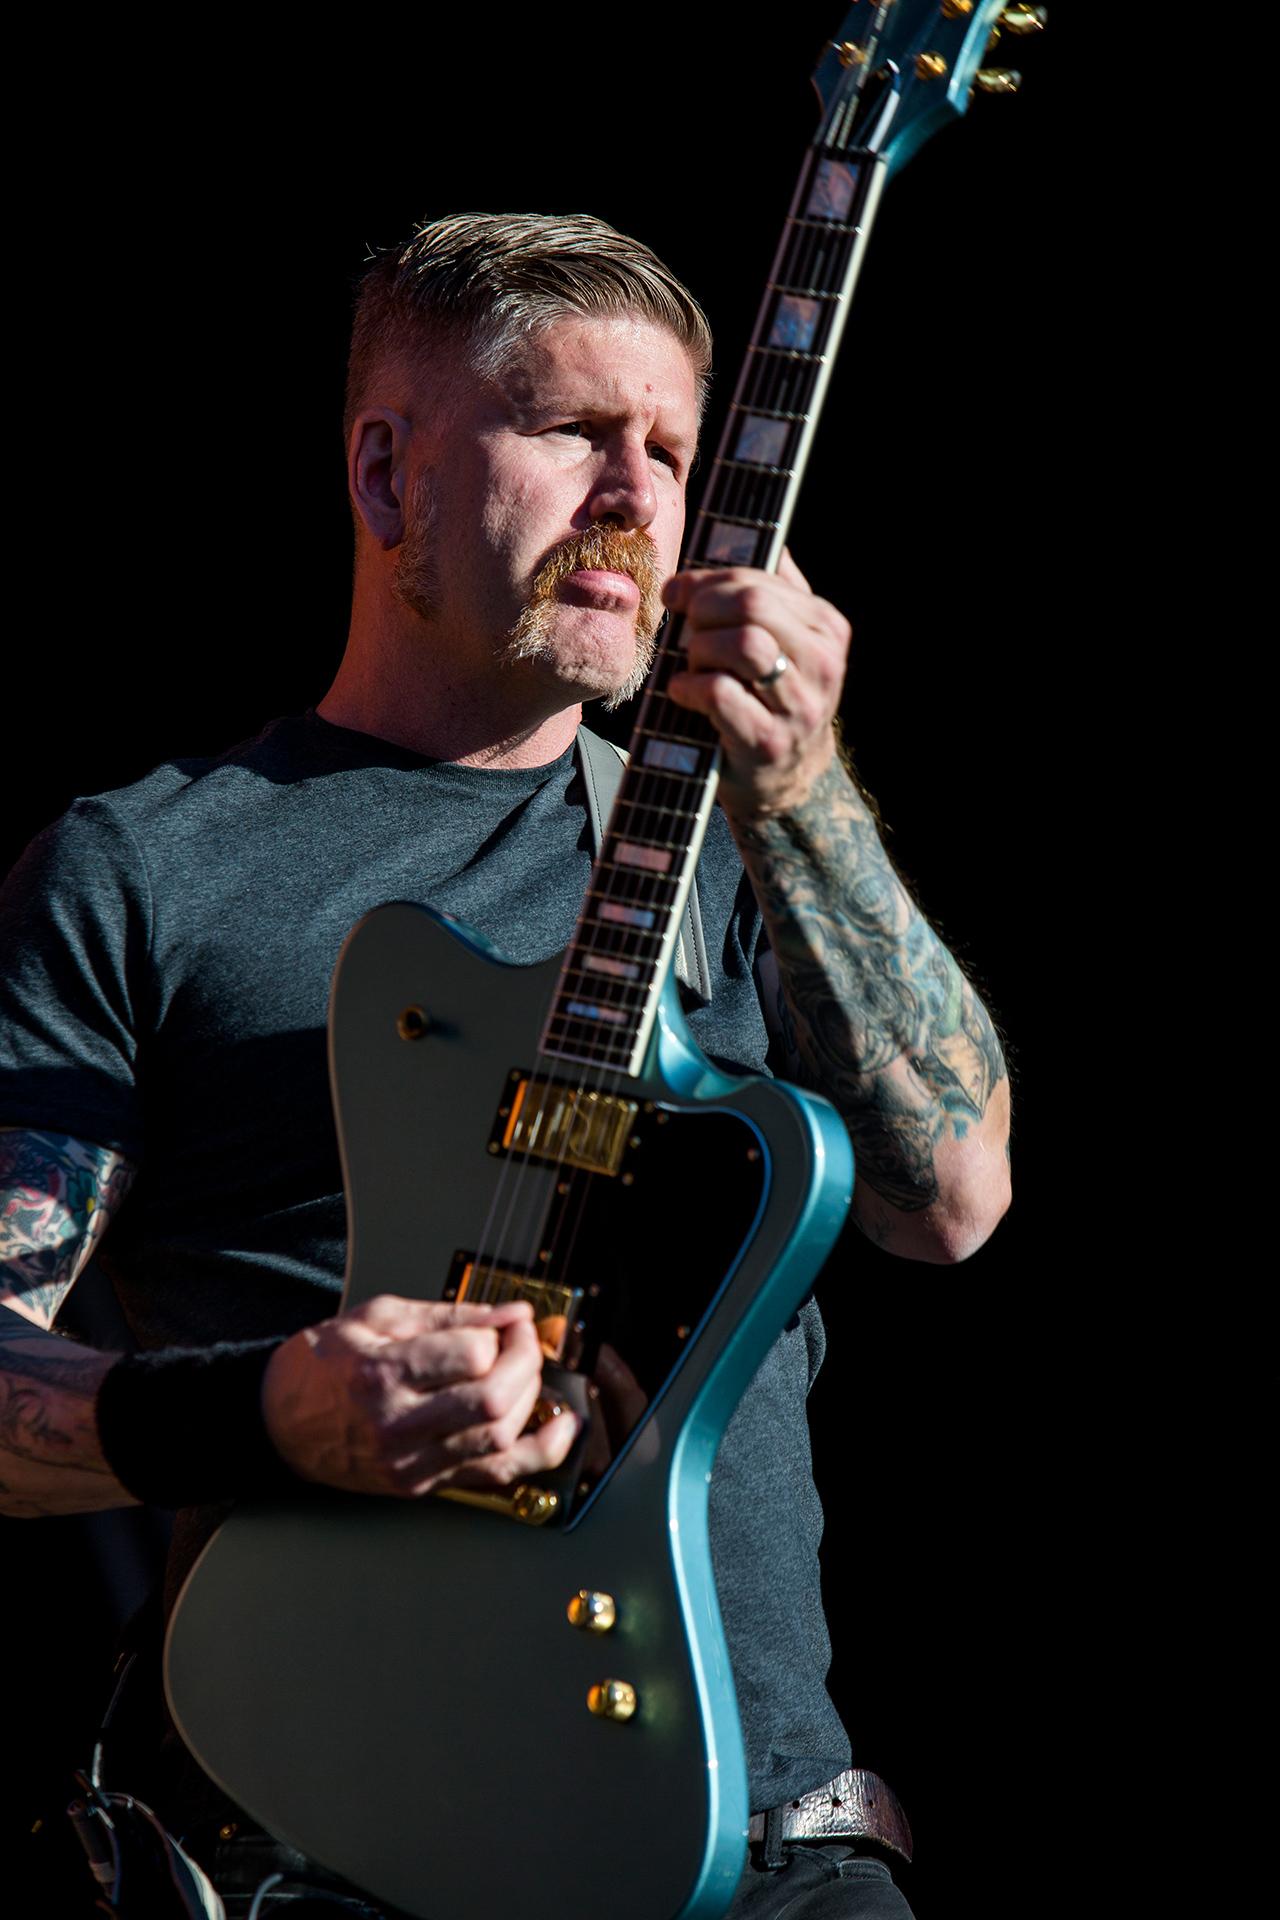 Bill Kelliher, guitarist, Mastodon band, Tuska metal festival